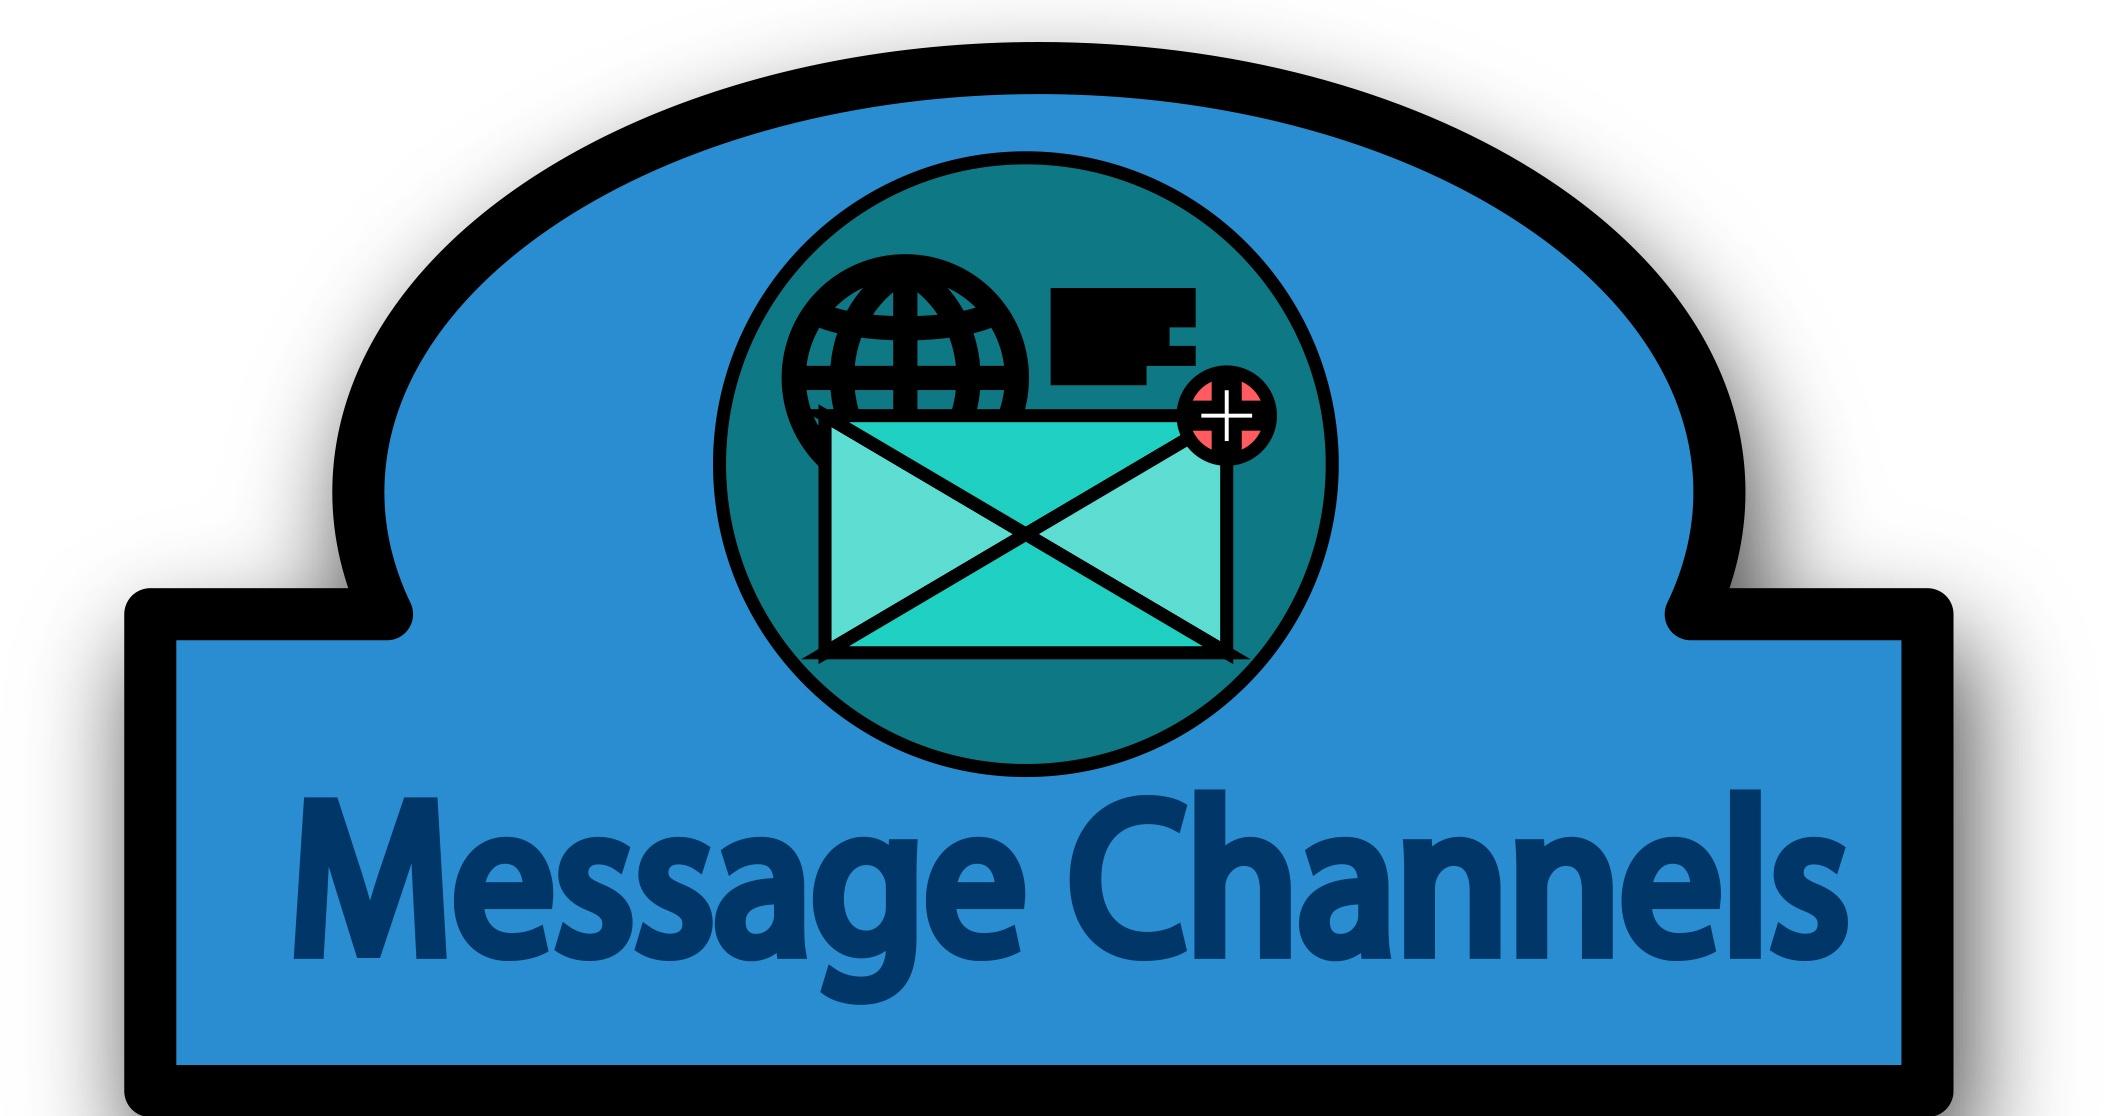 Message Channels